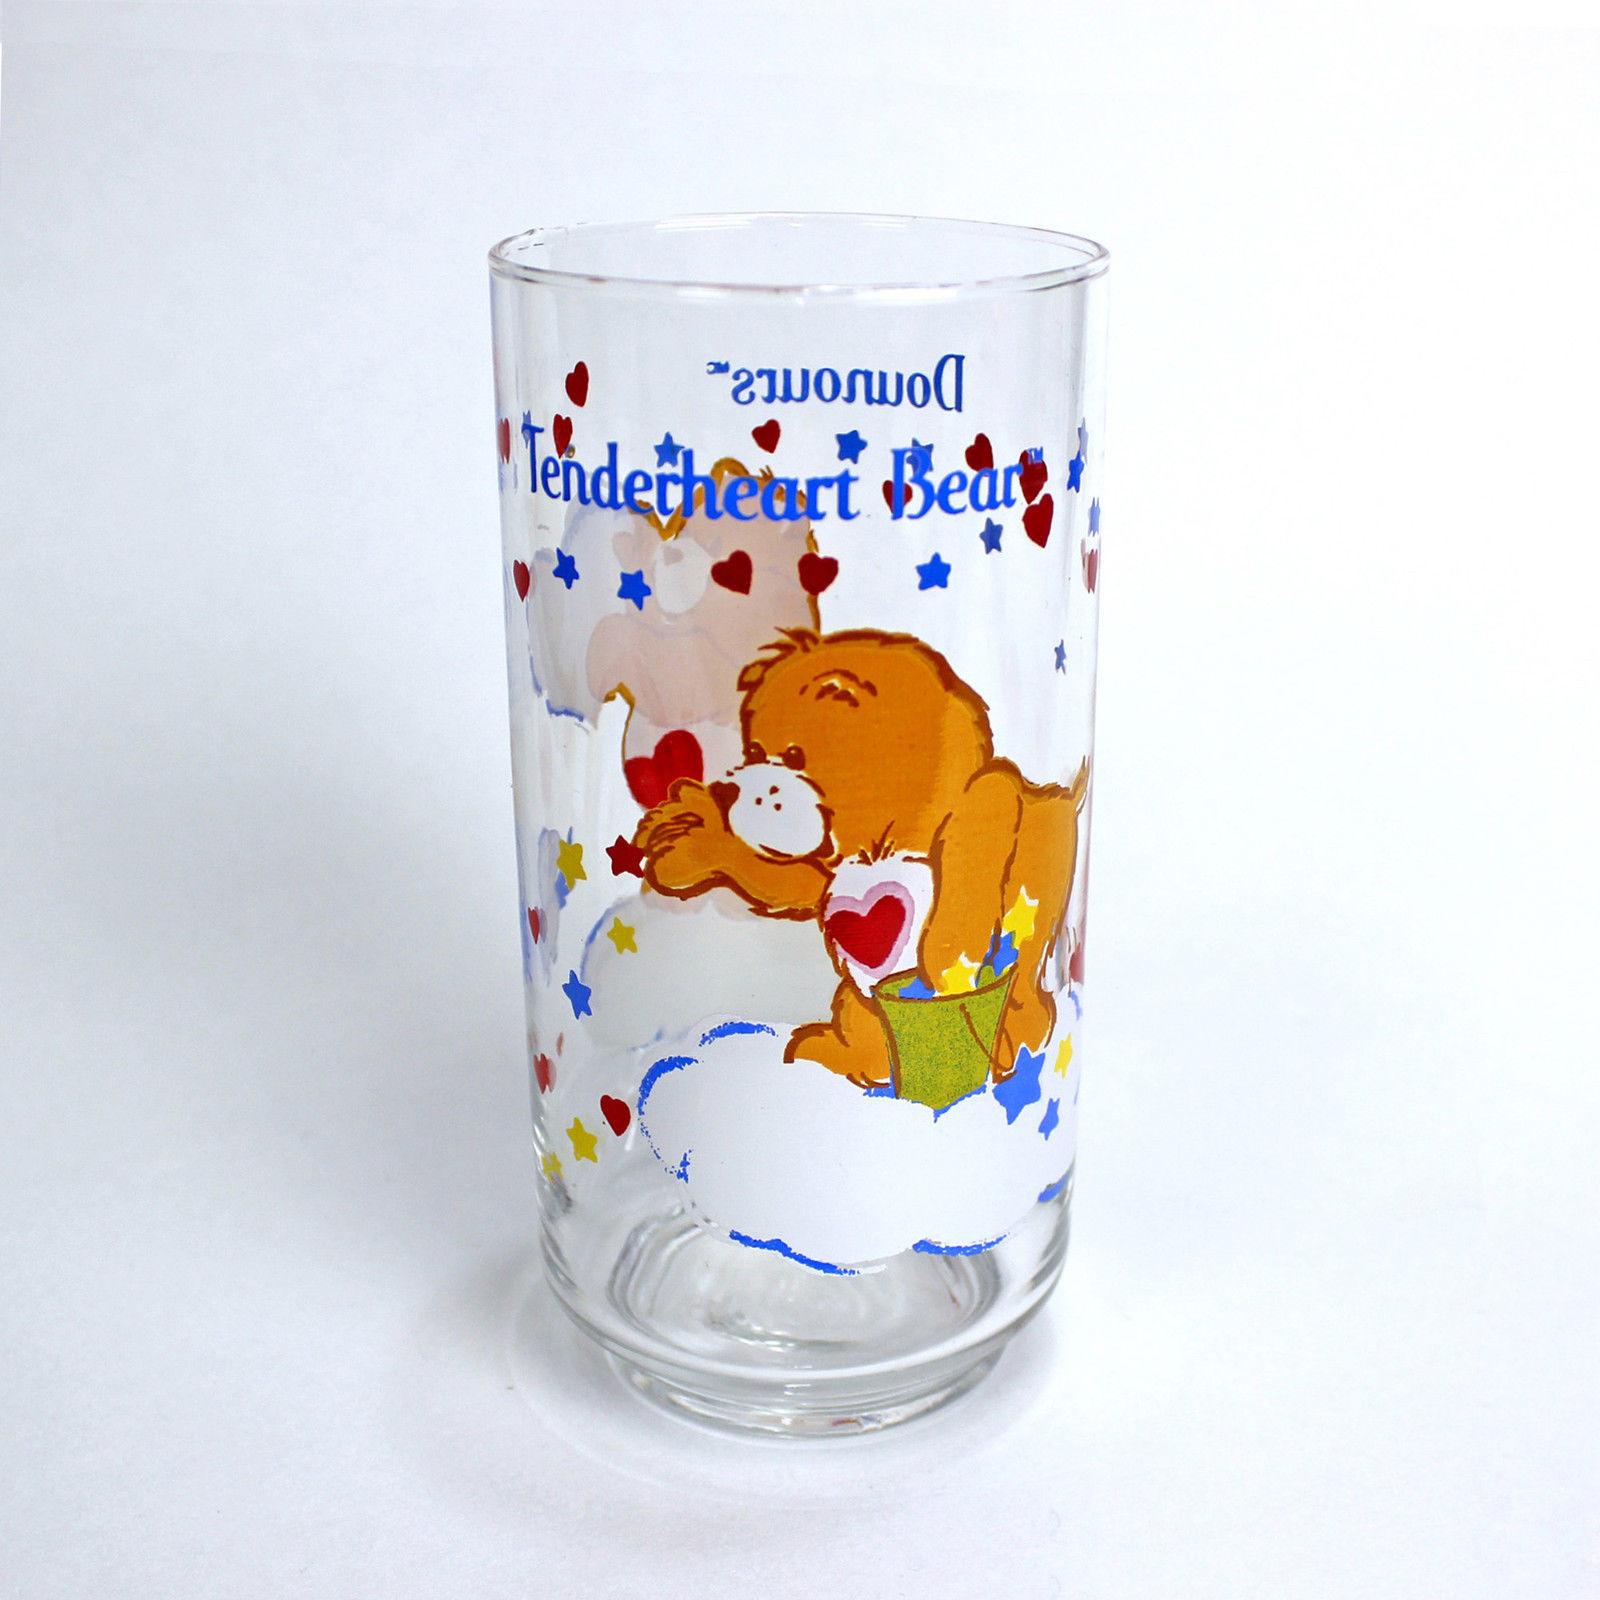 Care Bears Glass Tumbler Tenderheart Bear And Similar Items